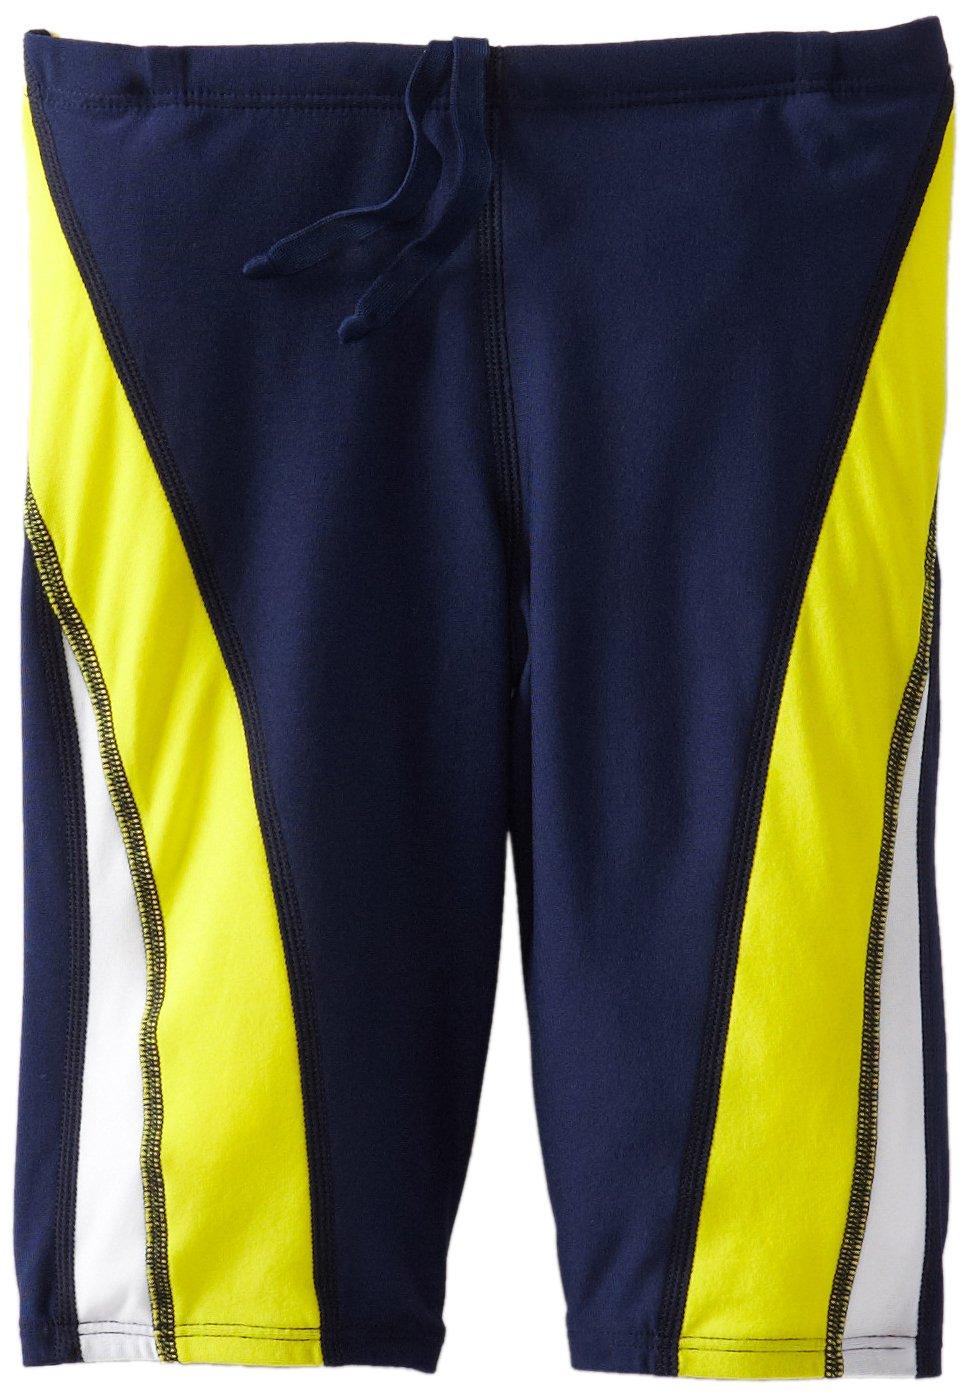 Speedo Big Boy's Youth Launch Splice Jammer Swimsuit 8051408